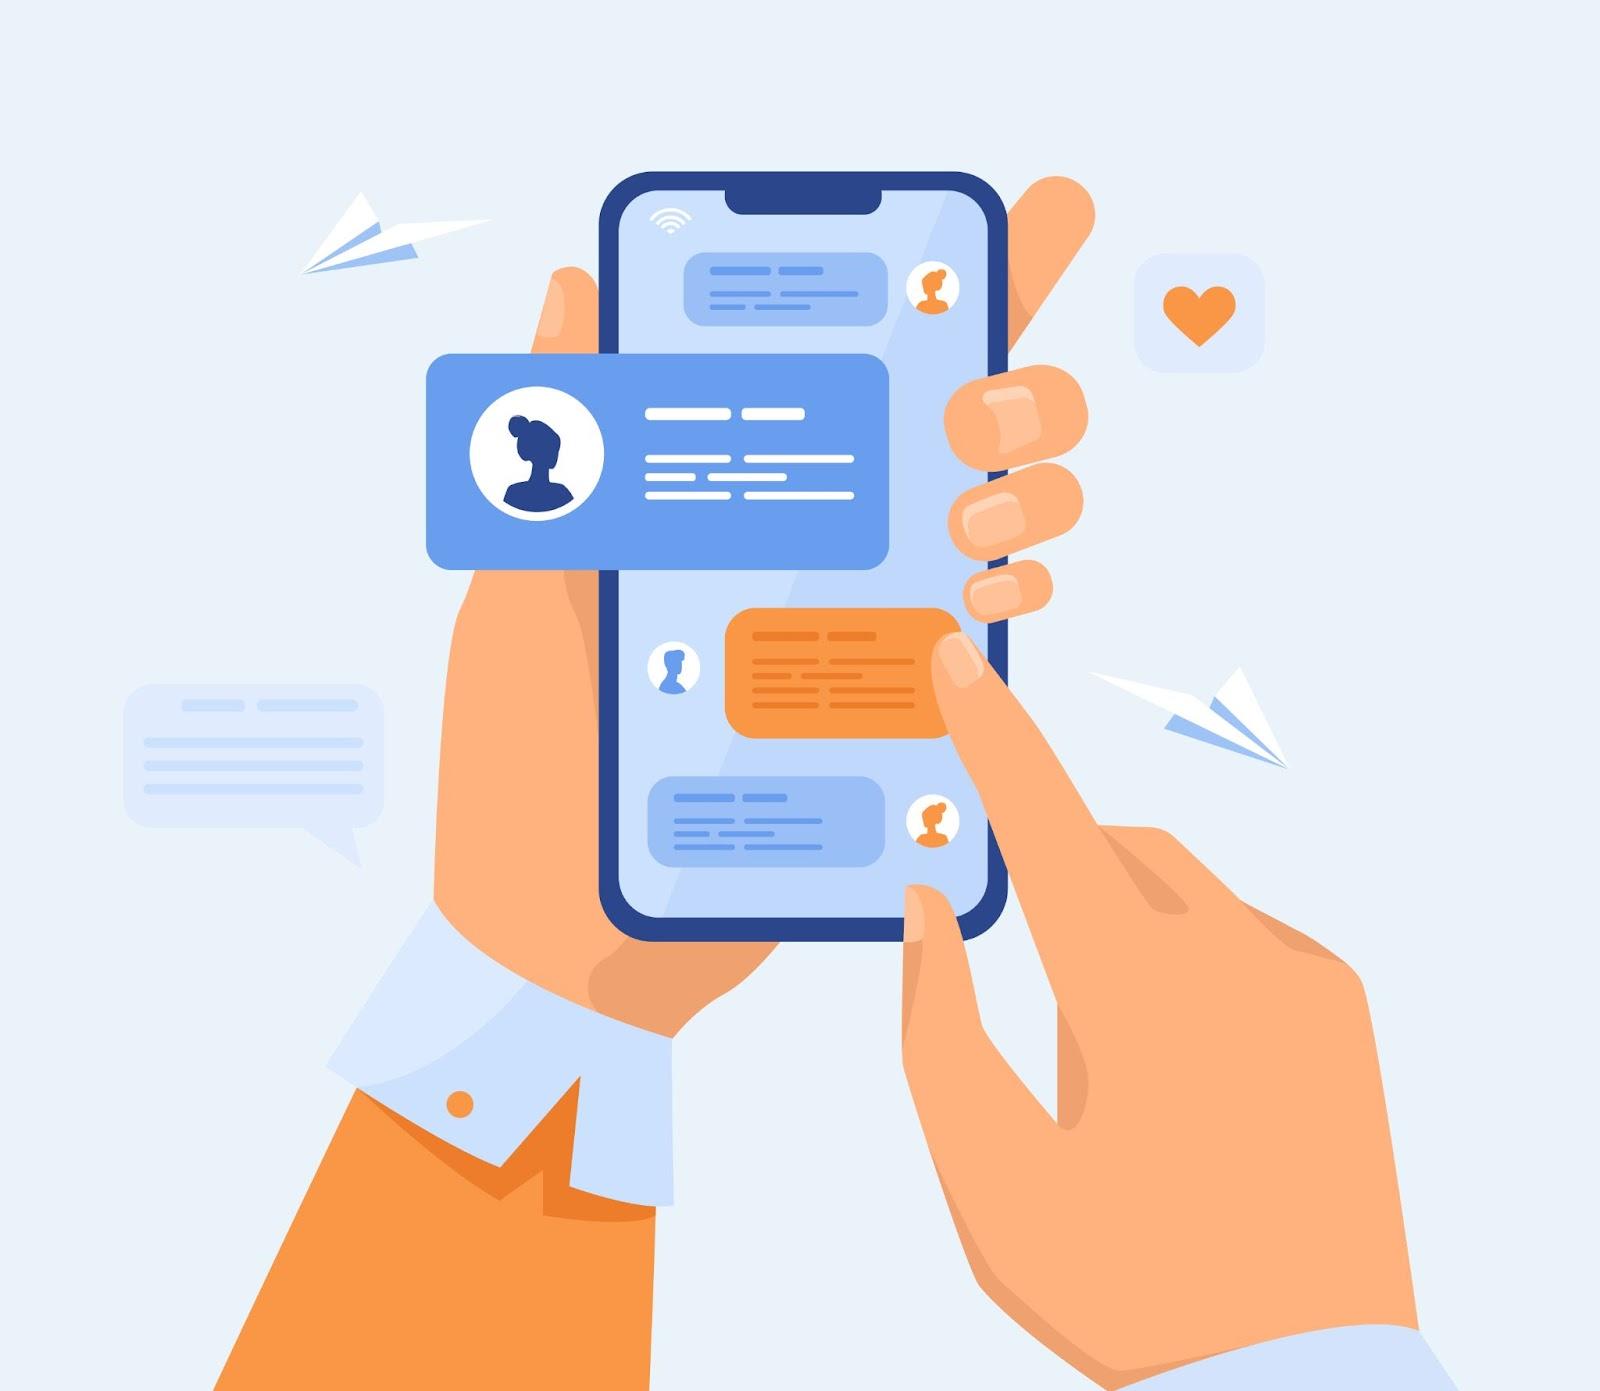 9 Worst SMS Marketing Mistakes